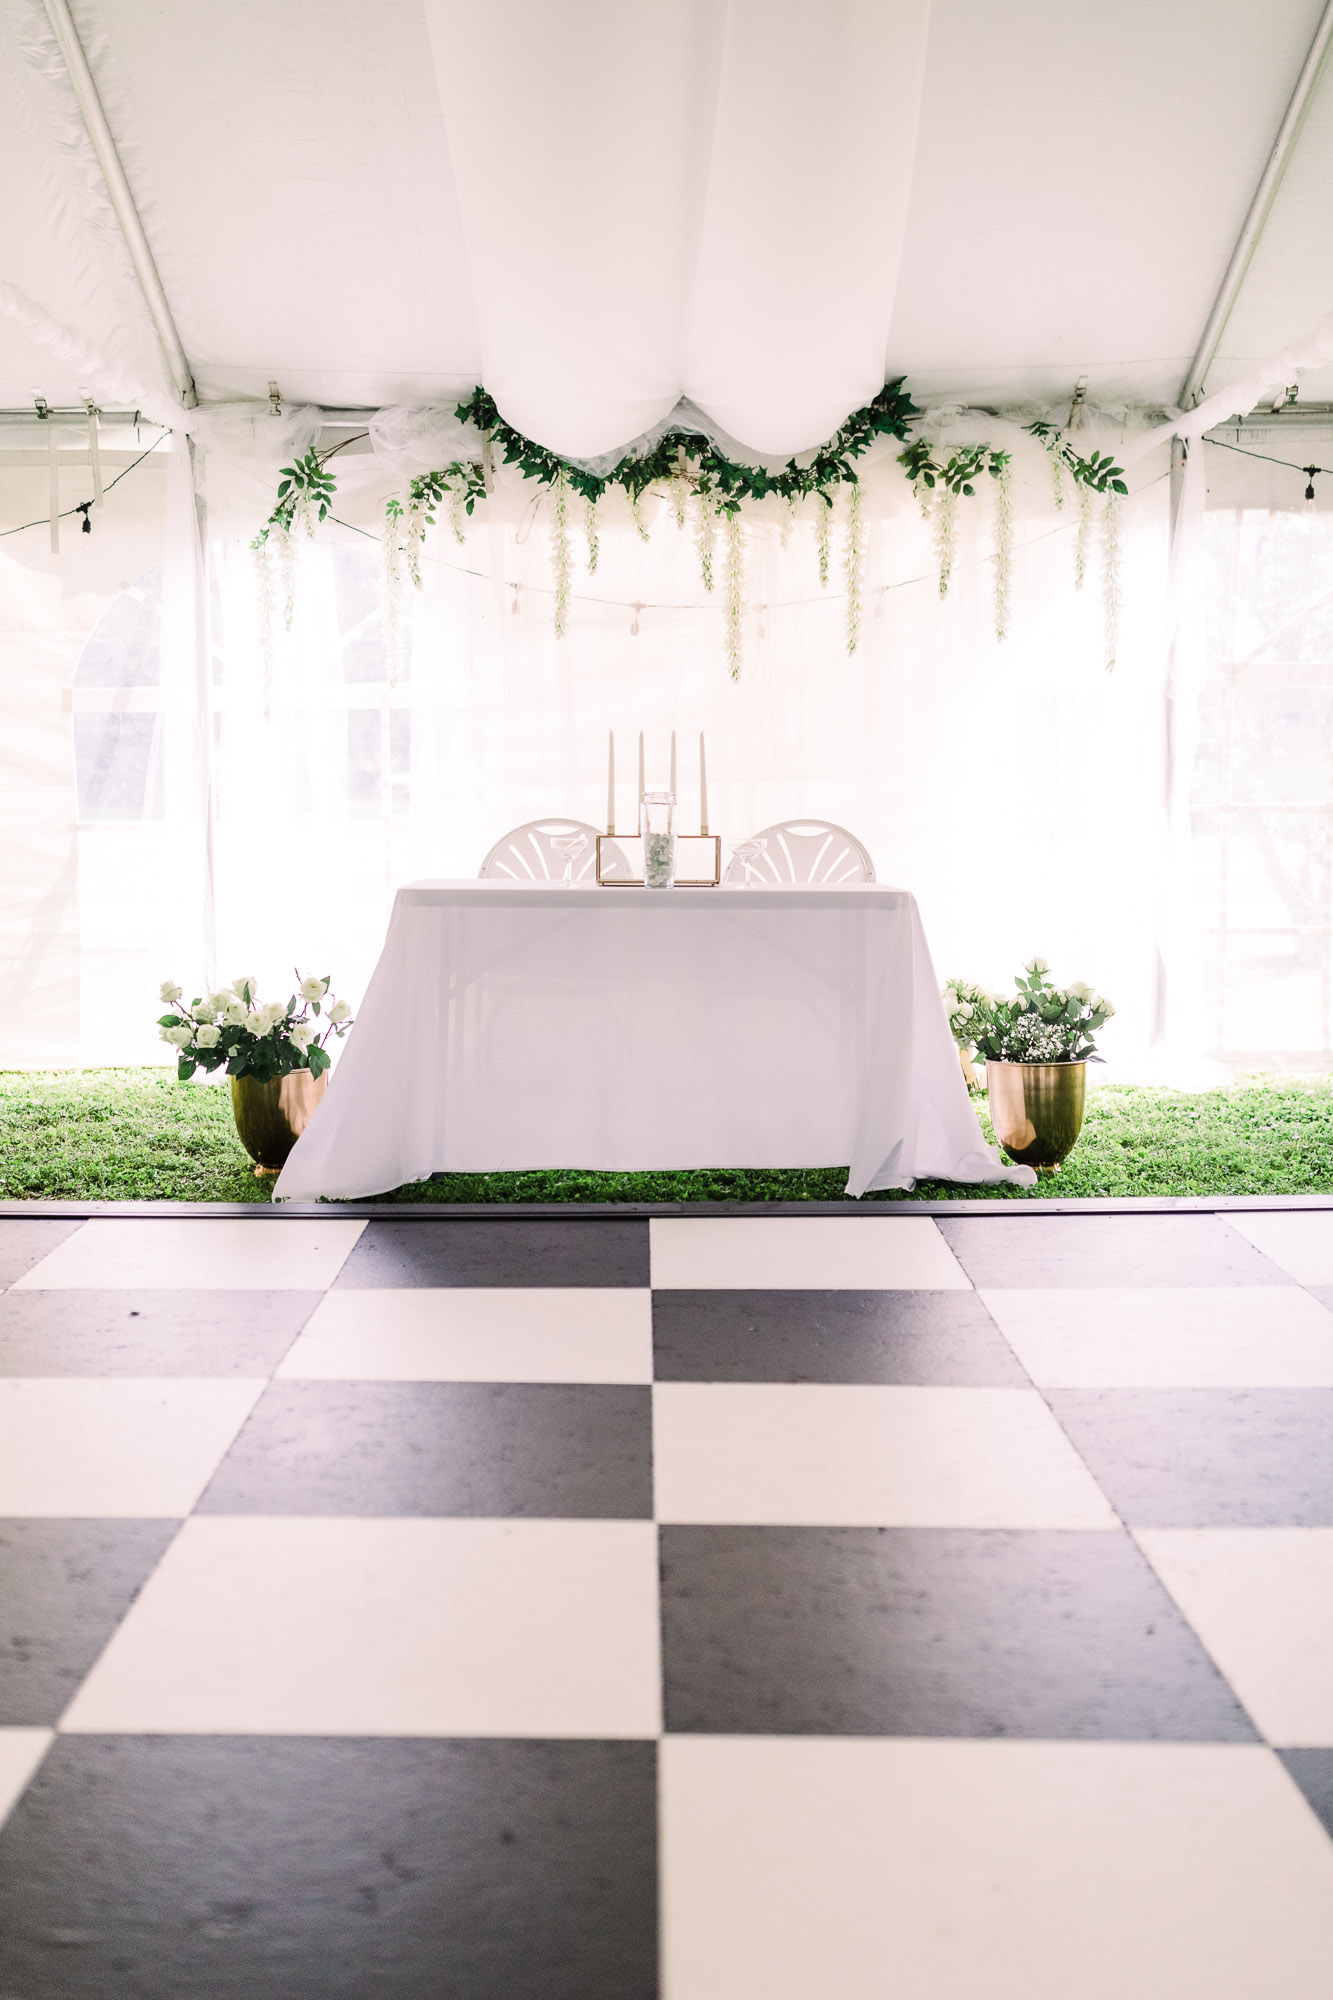 isle-of-que-wedding-6572.jpg